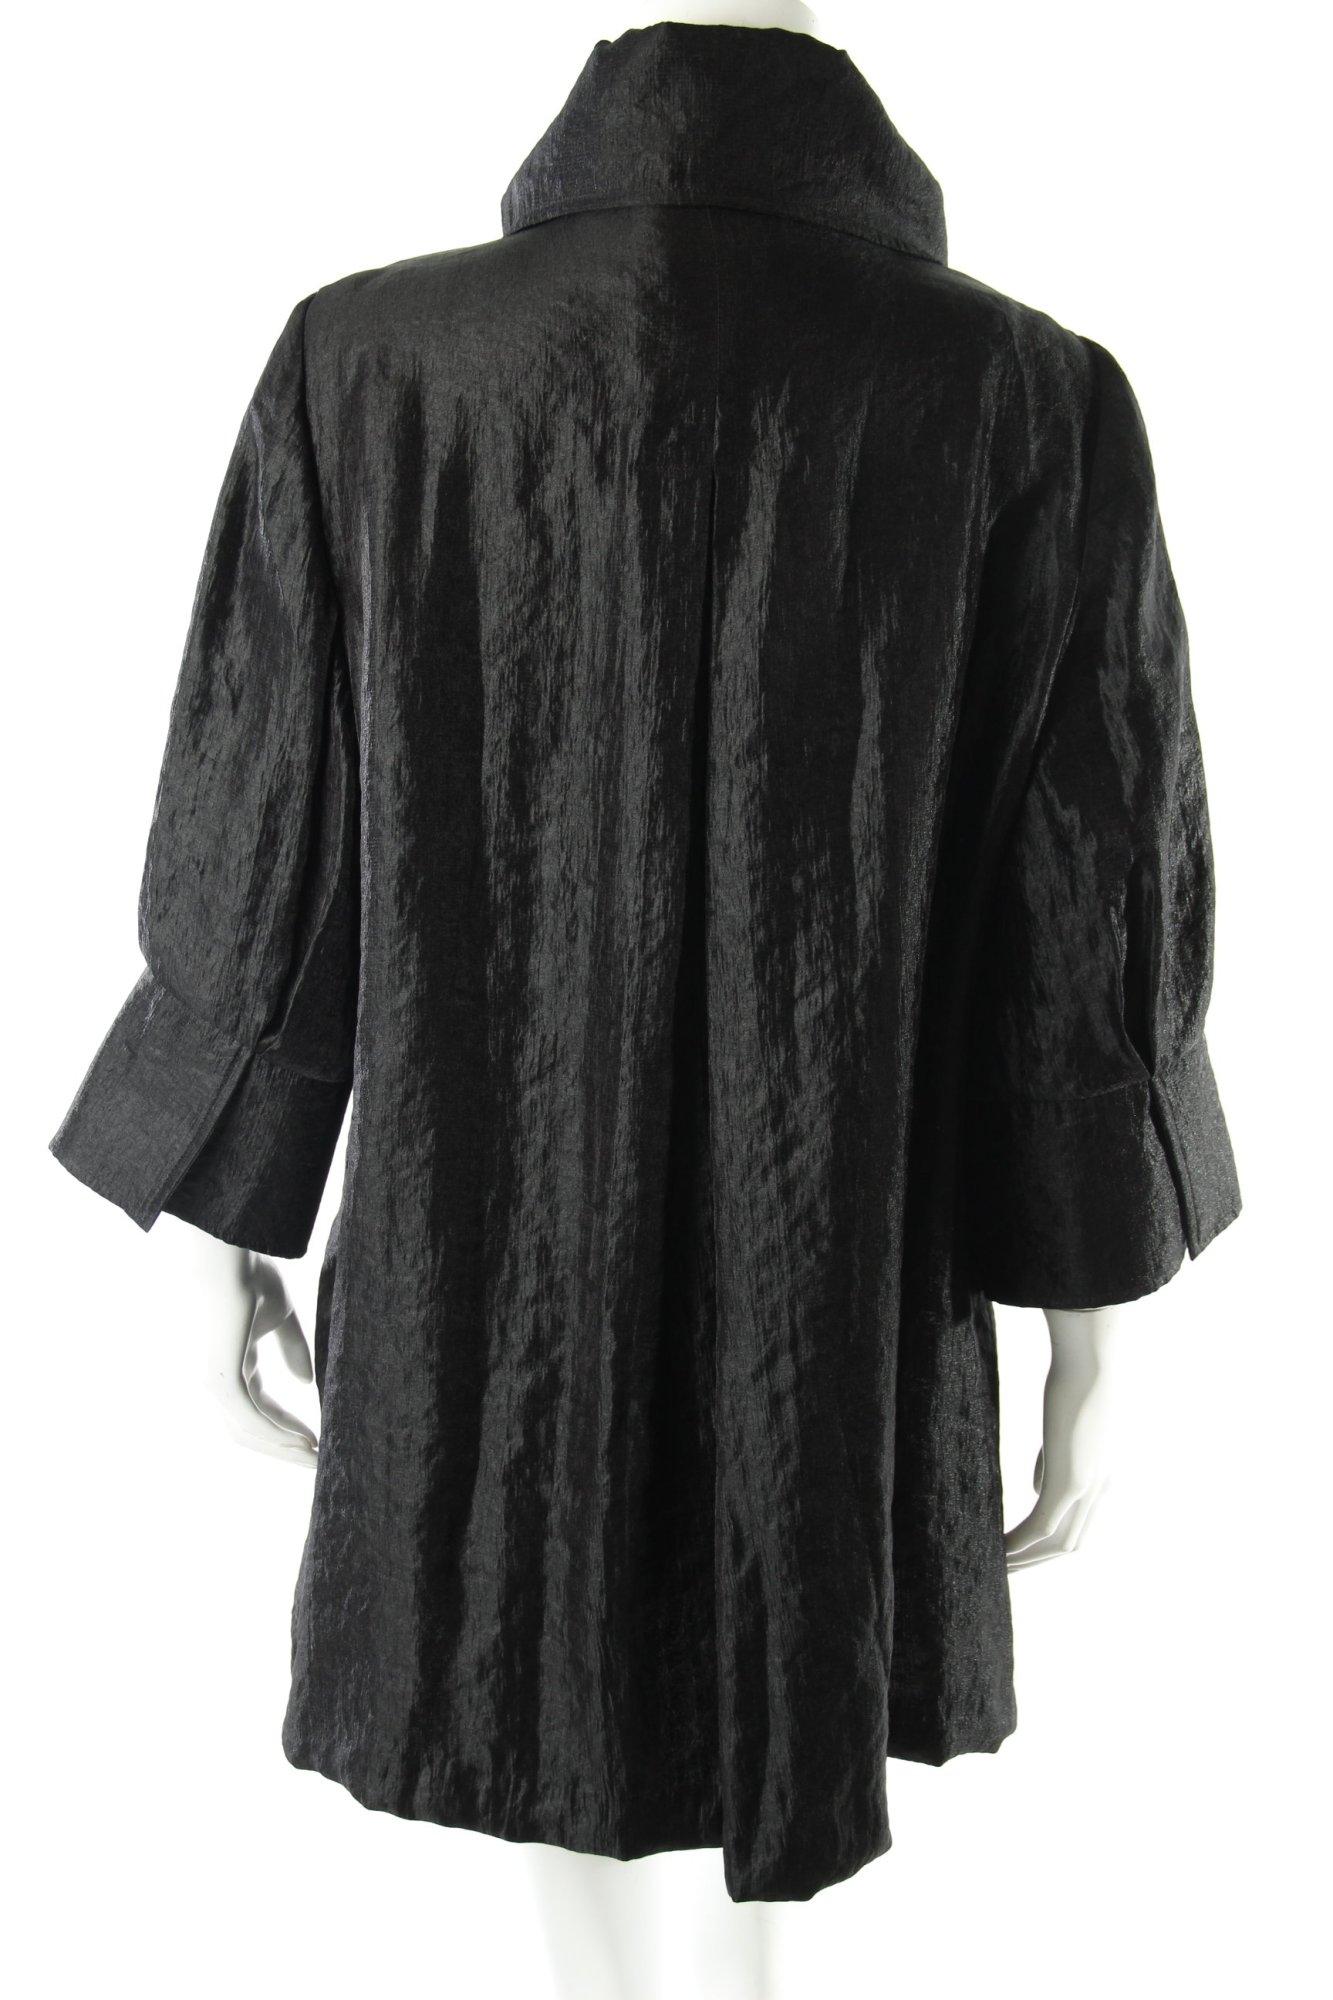 joseph ribkoff mantel schwarz glanz optik damen gr de 40 coat ebay. Black Bedroom Furniture Sets. Home Design Ideas